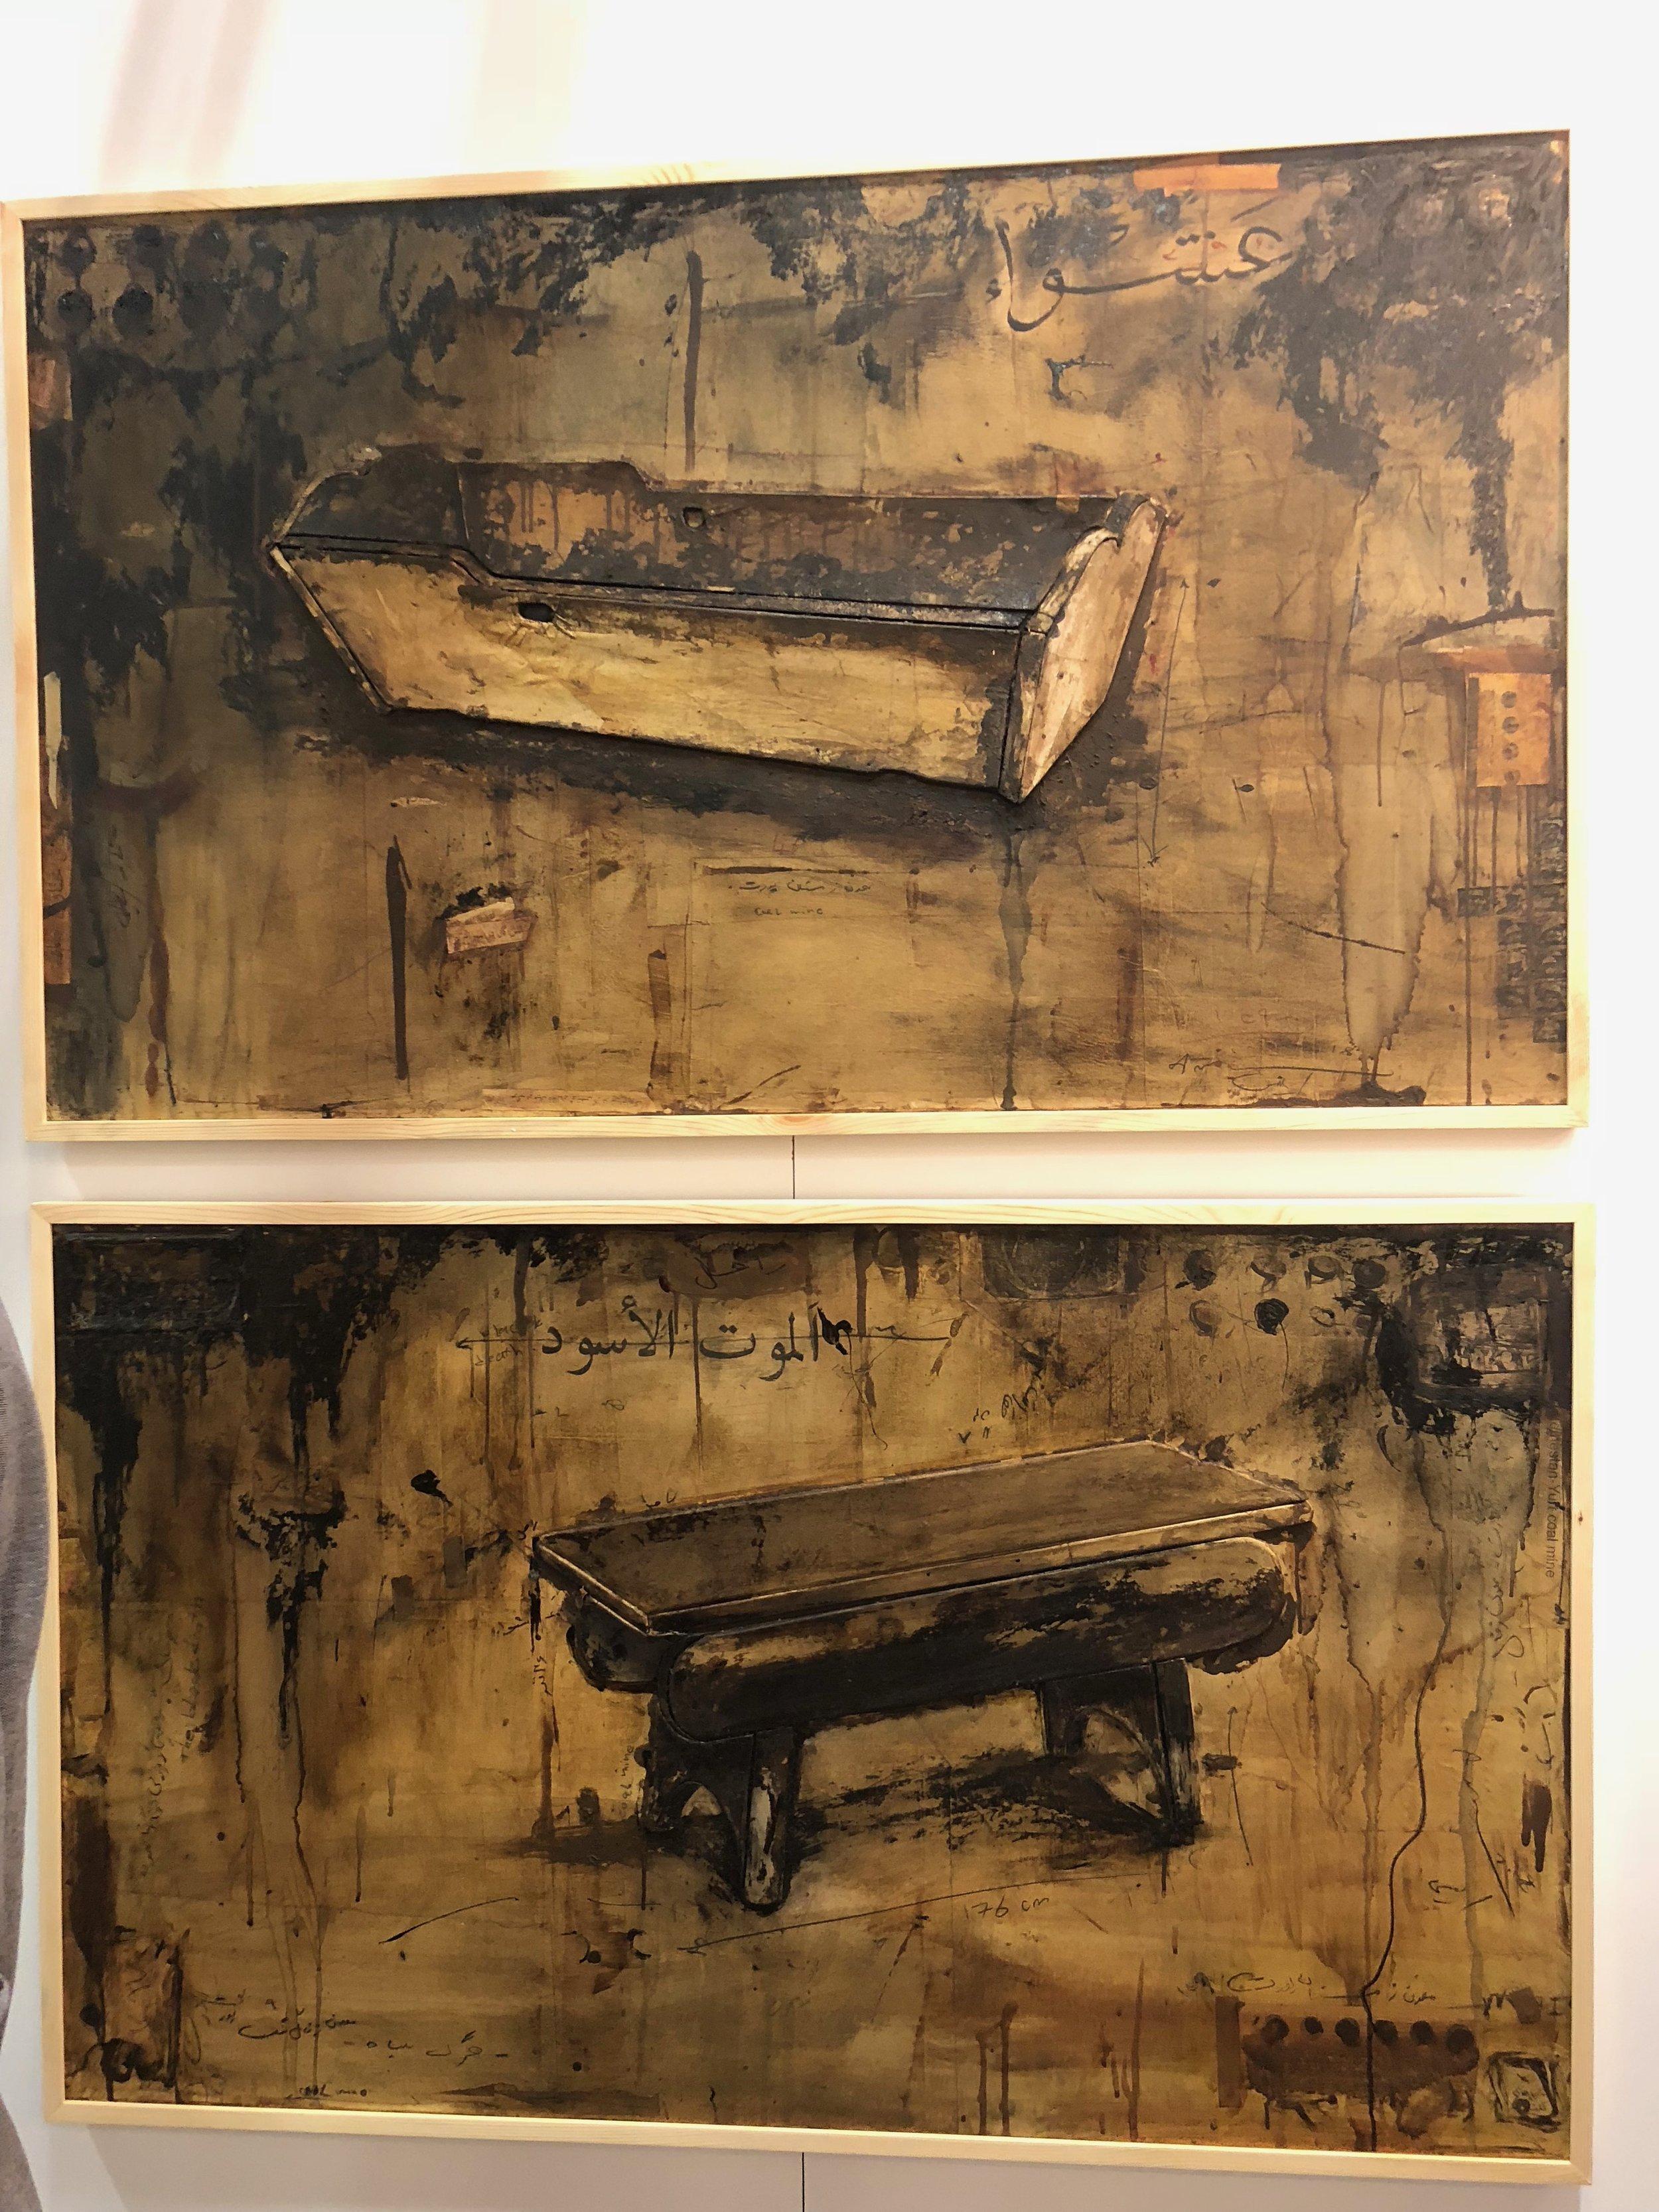 Mojtabi Amini's mixed media works at Mohsen Gallery